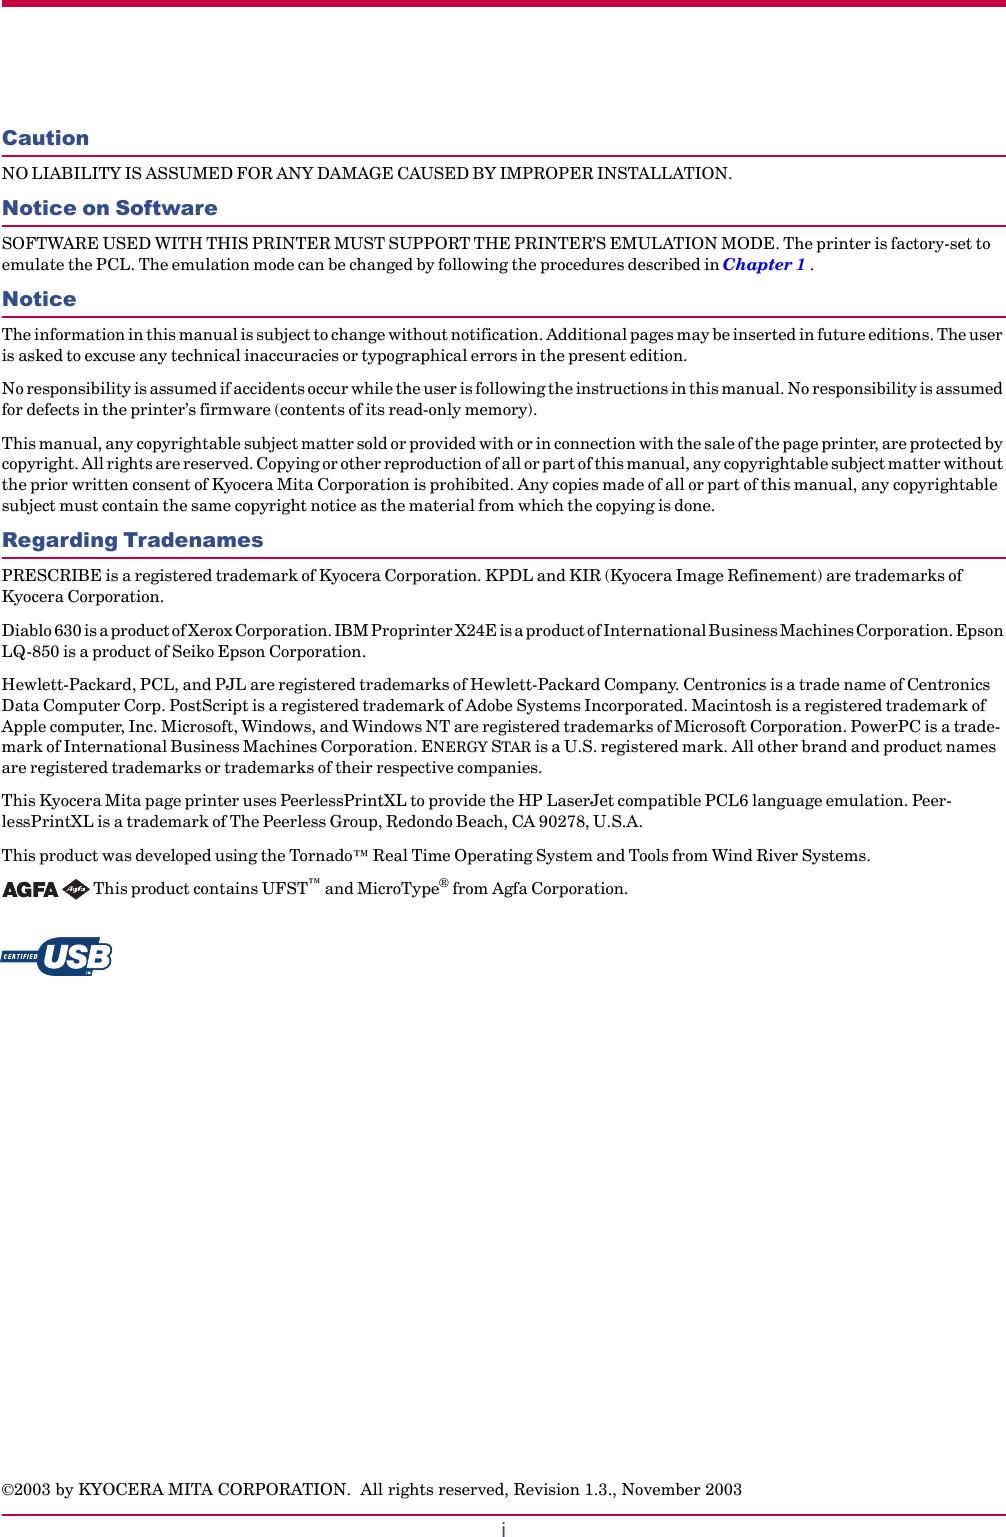 Kyocera Fs 1010 Users Manual